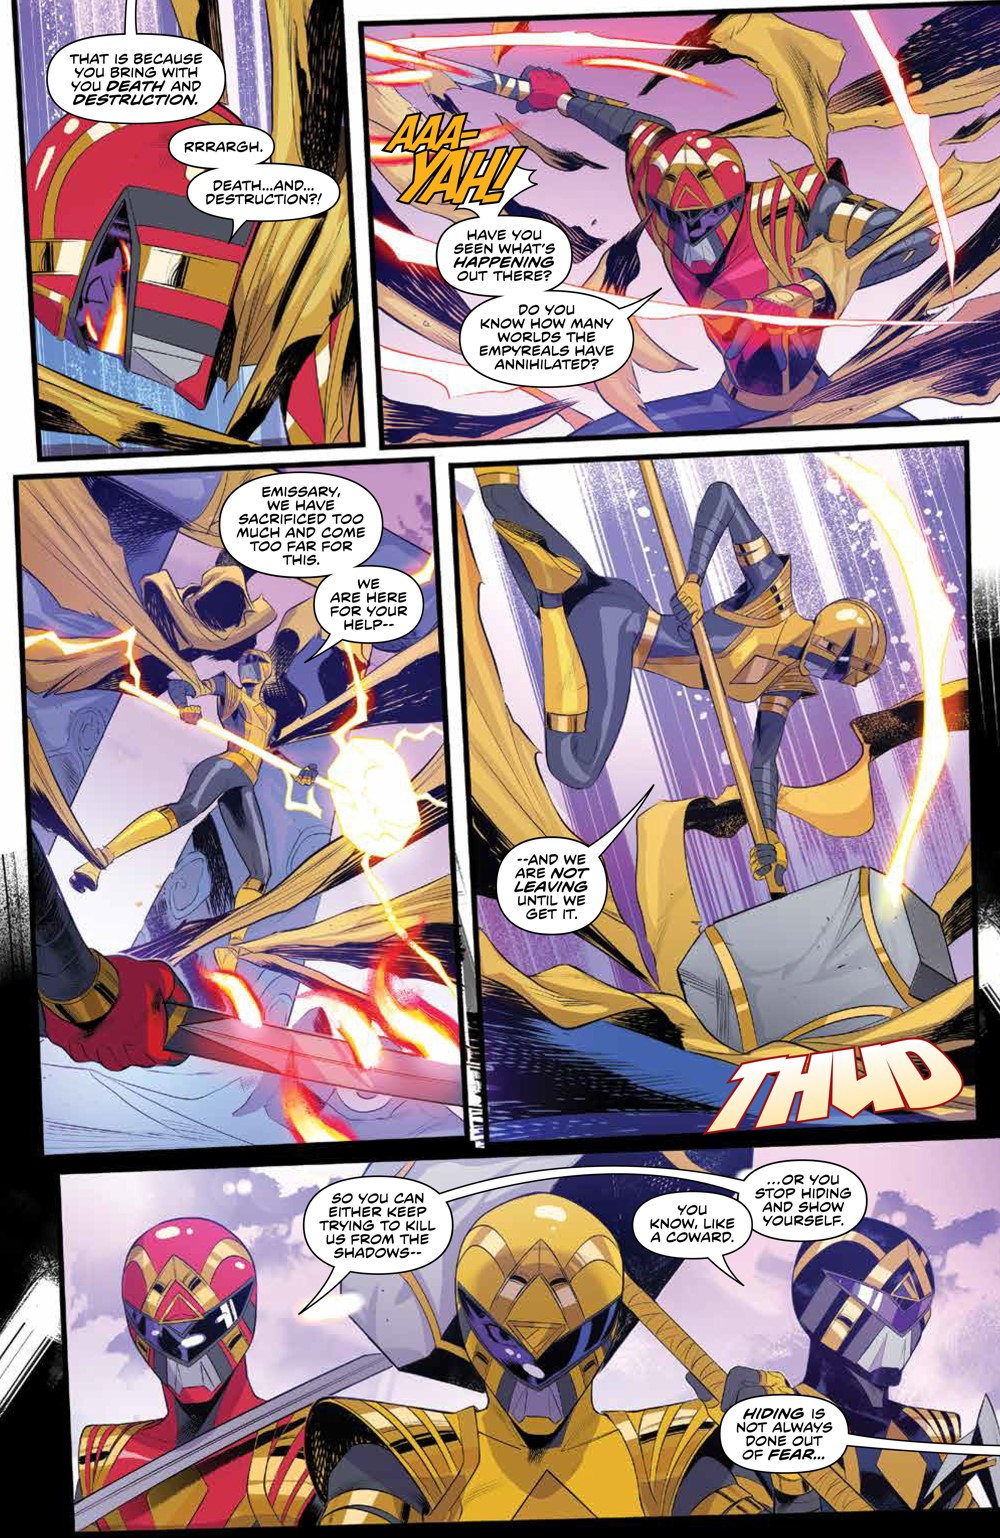 PowerRangers_011_PRESS_7 ComicList Previews: POWER RANGERS #11